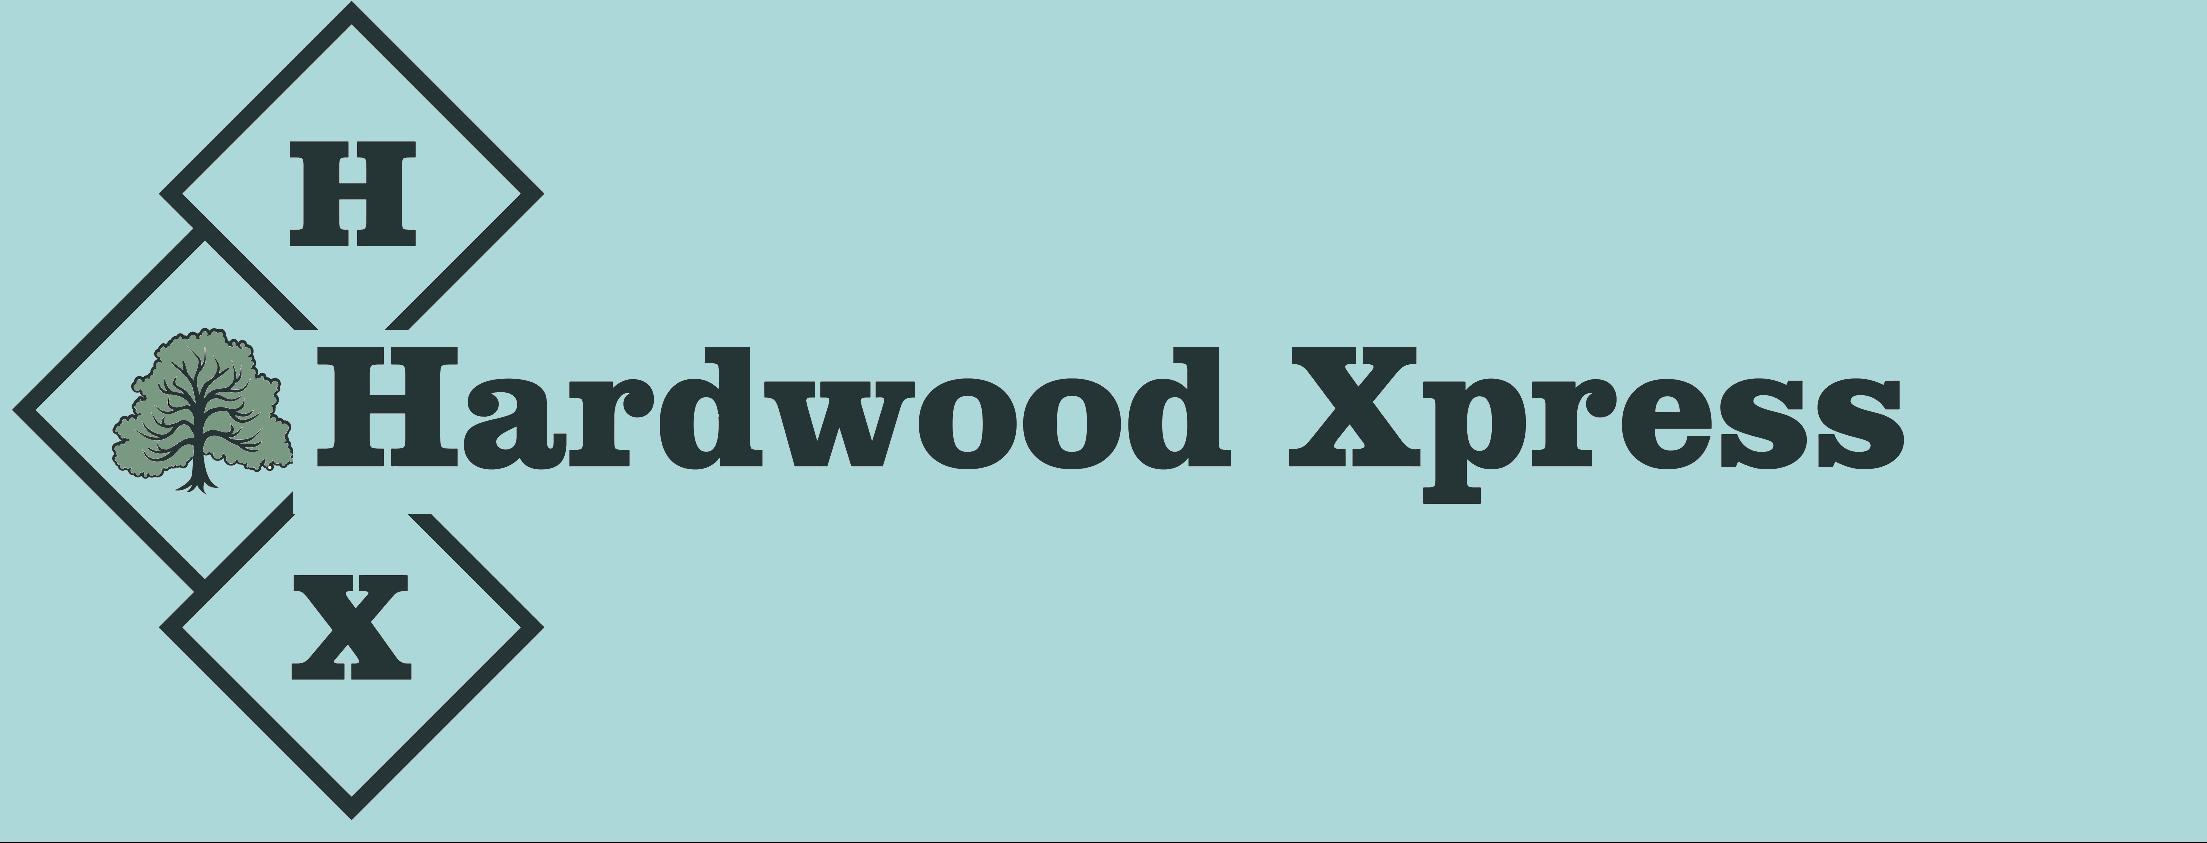 Hardwood Xpress